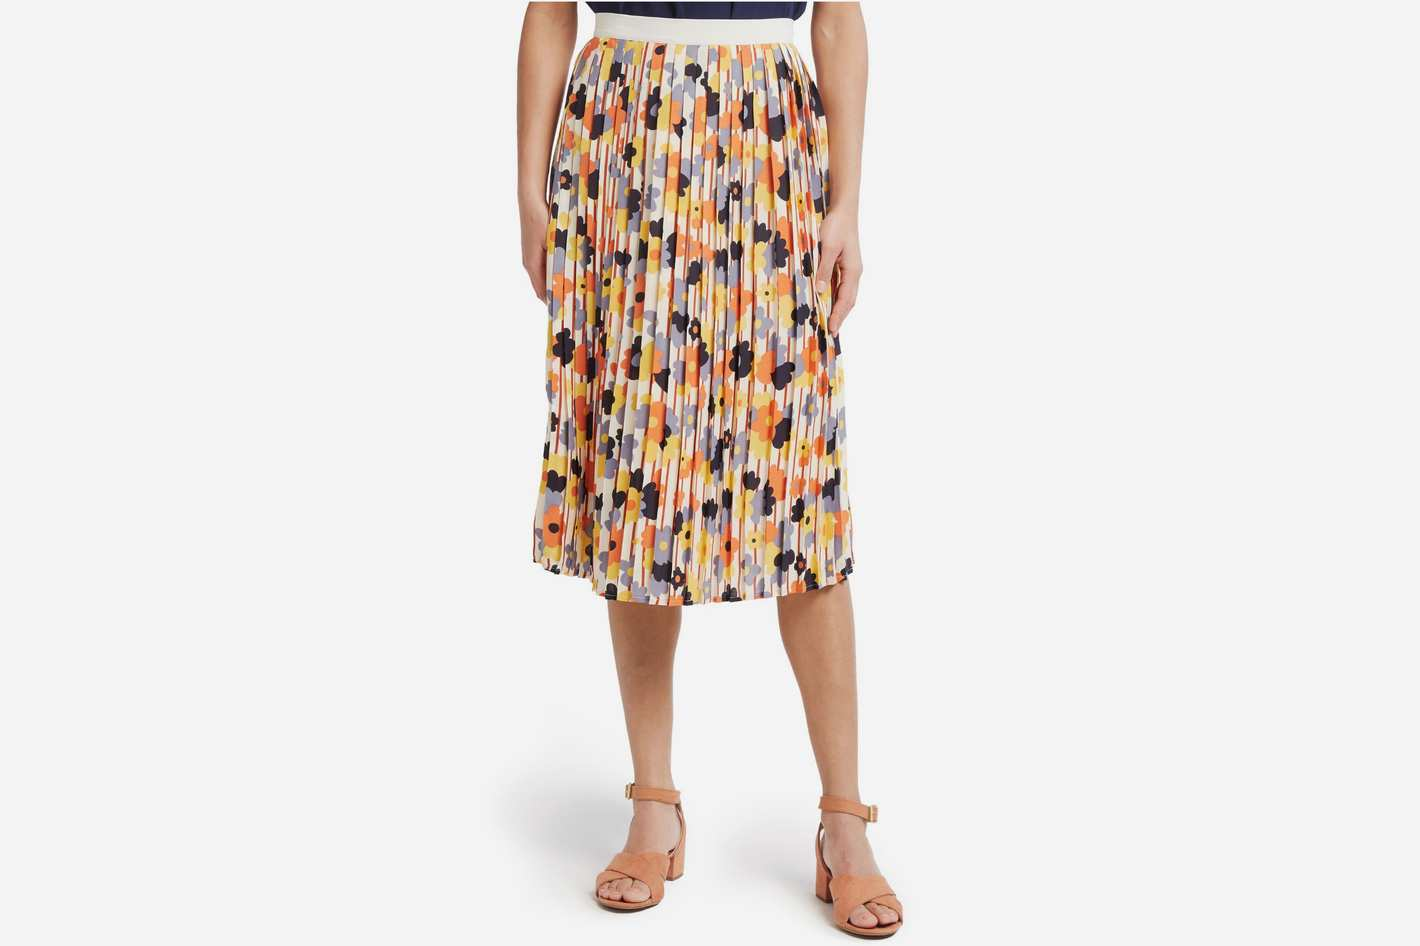 ModCloth Beautifully Upbeat Pleated Skirt